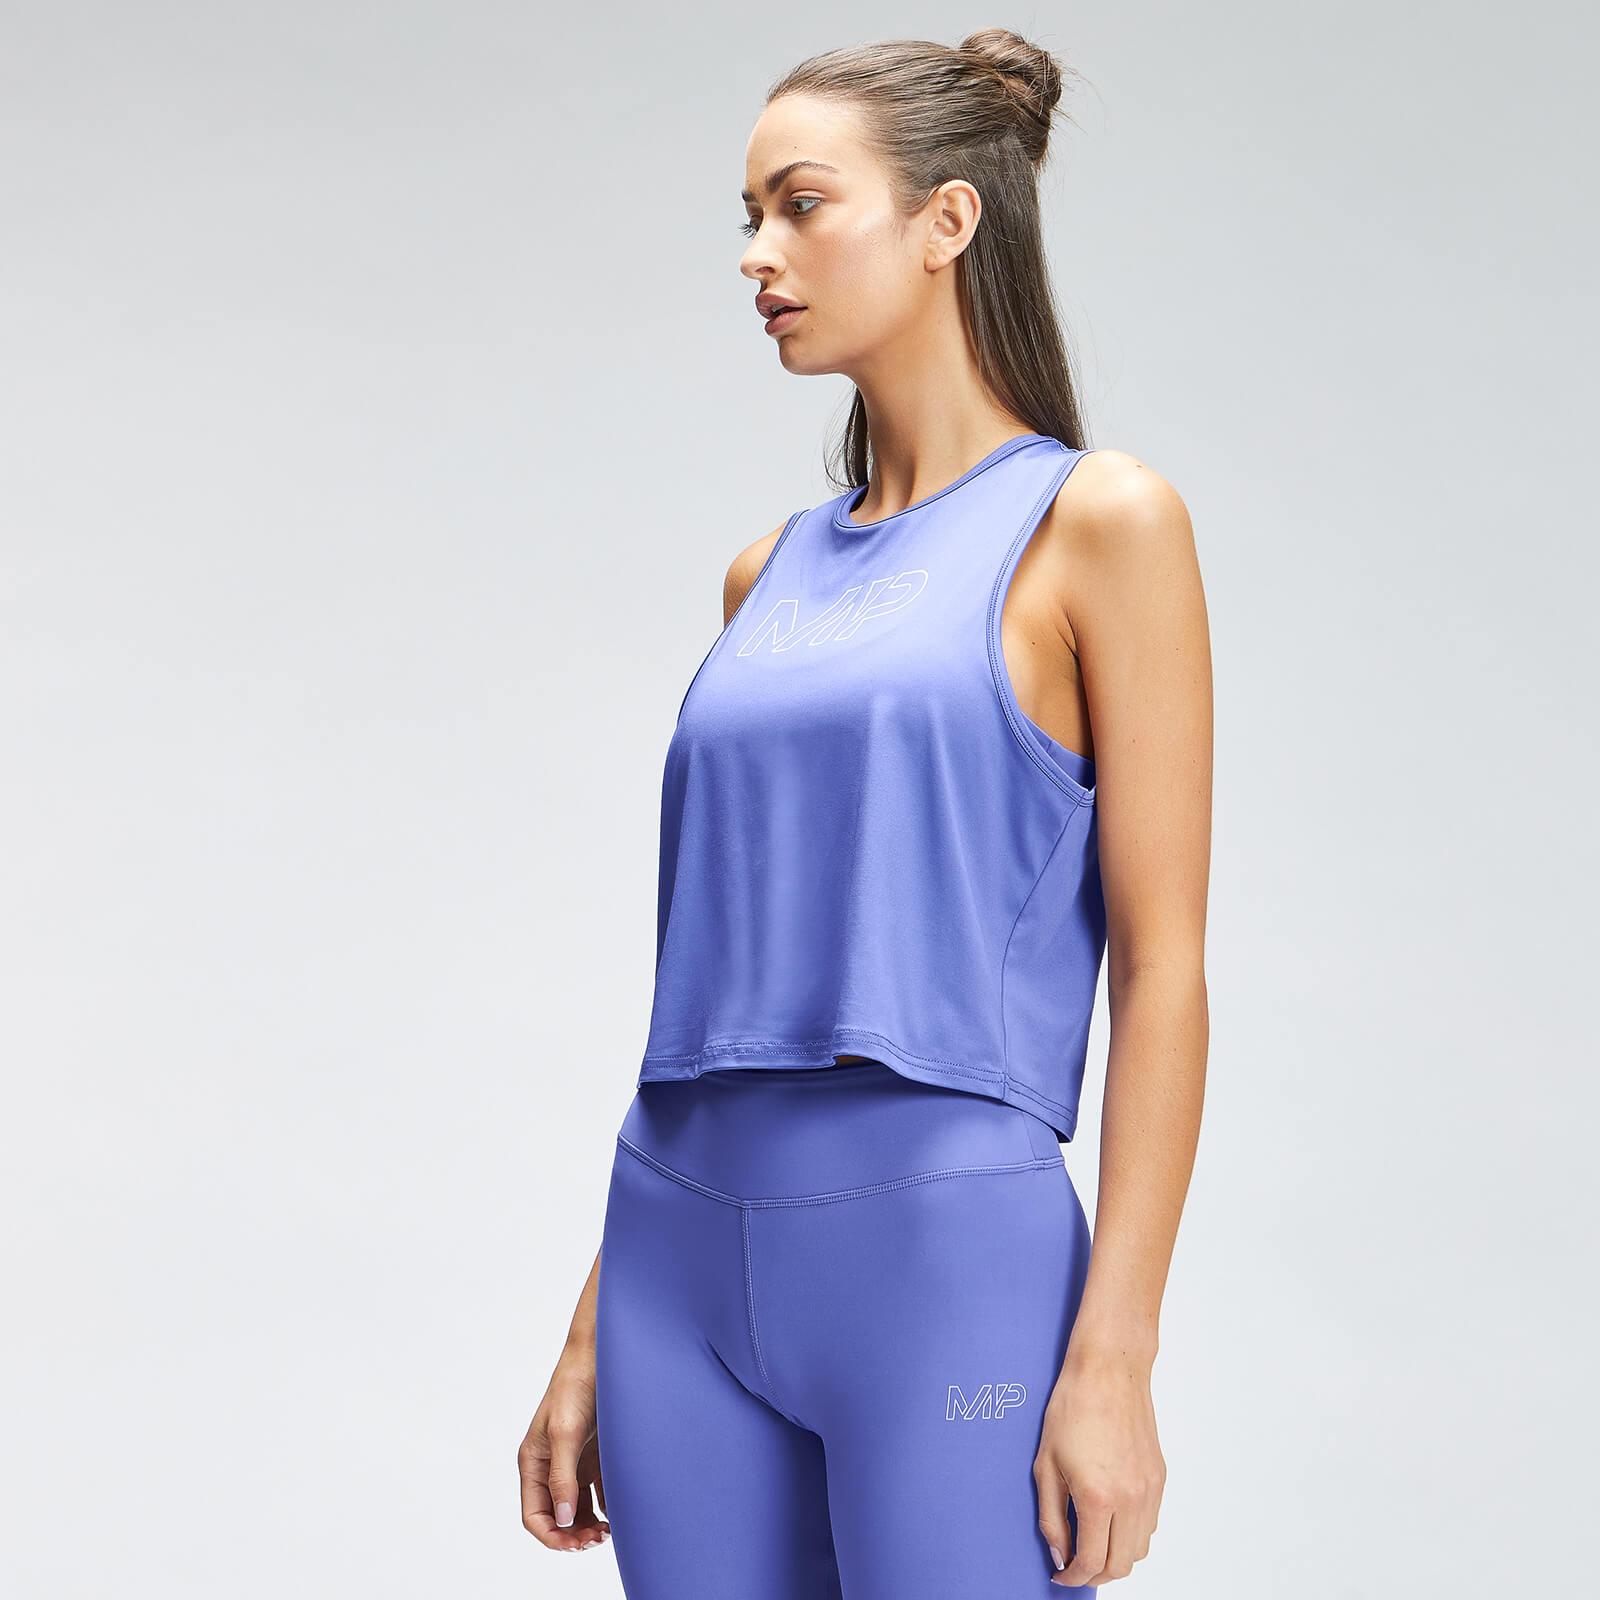 Купить MP Women's Repeat Mark Graphic Training Crop Vest - Bluebell - XXS, Myprotein International